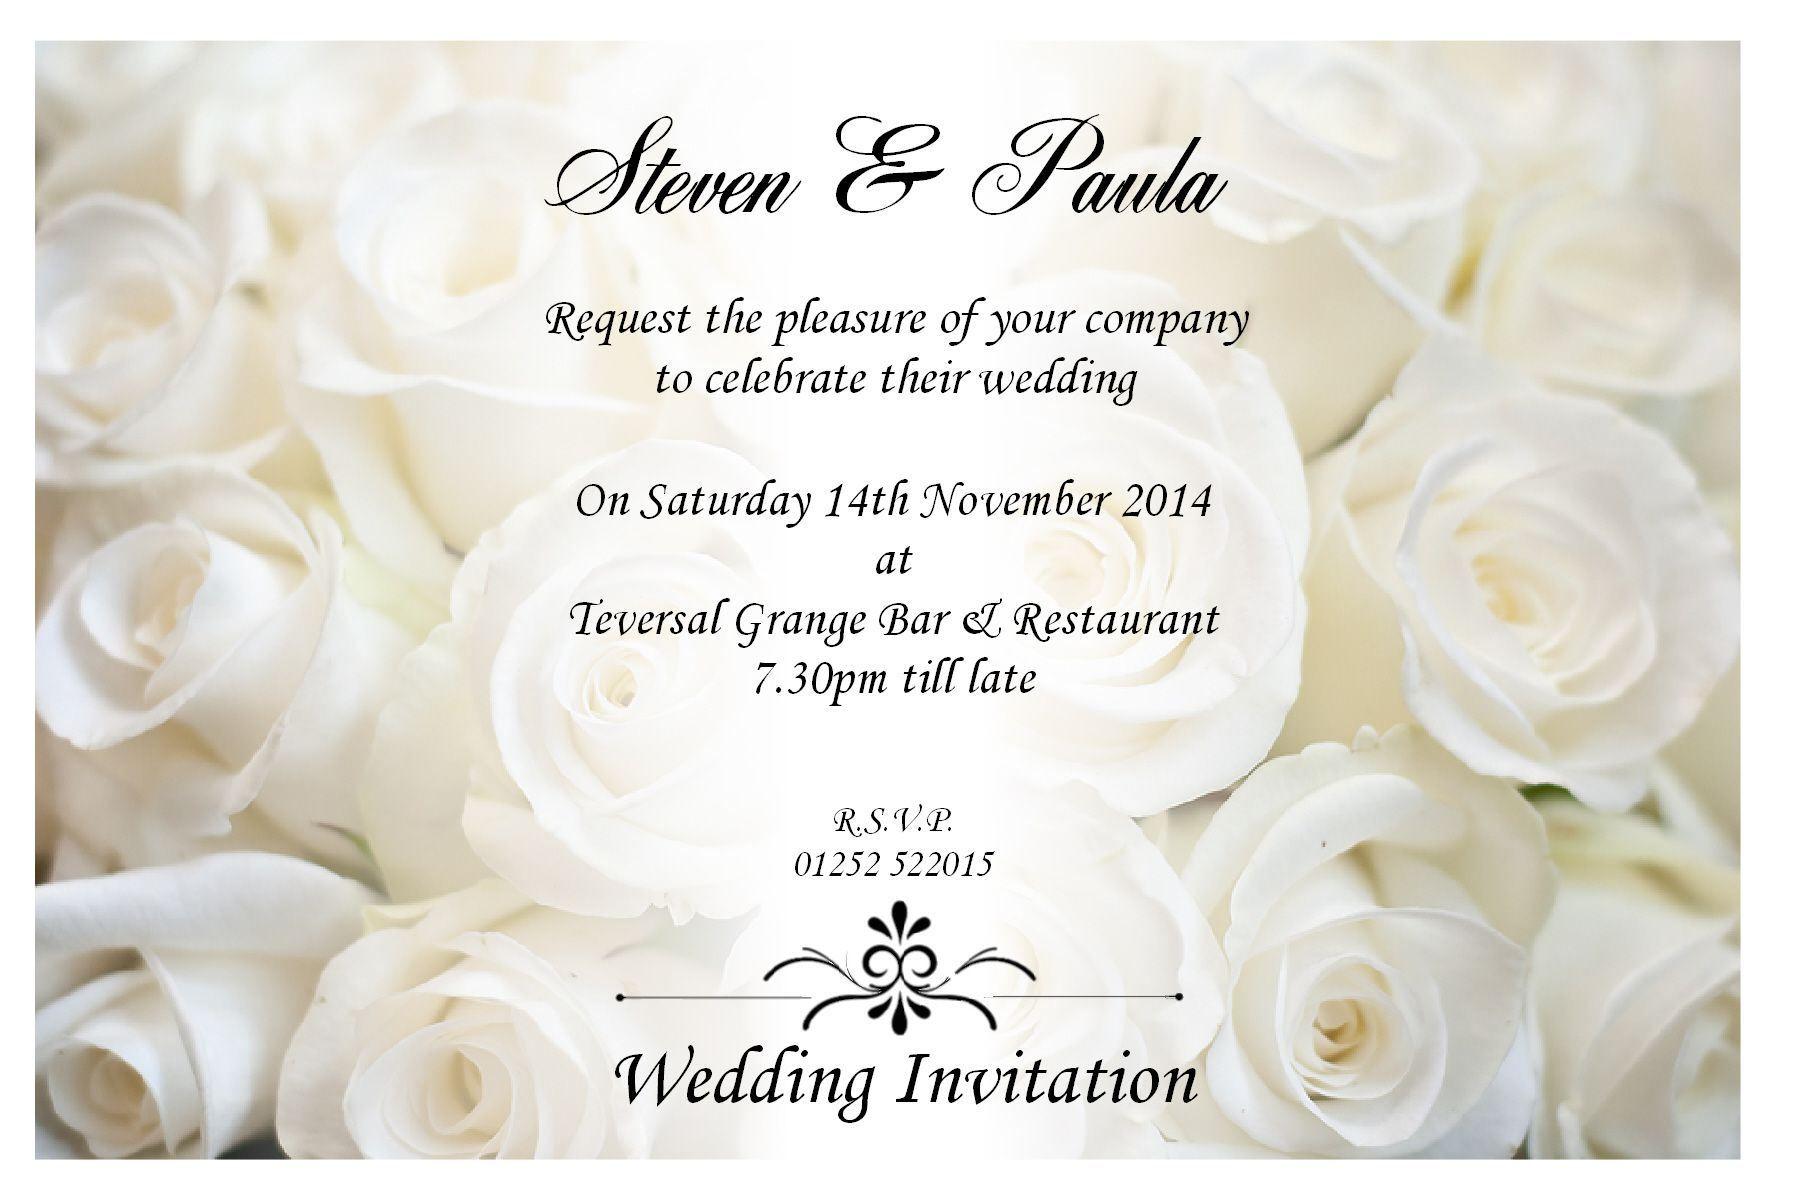 sample wedding invitations sample wedding invitation by email